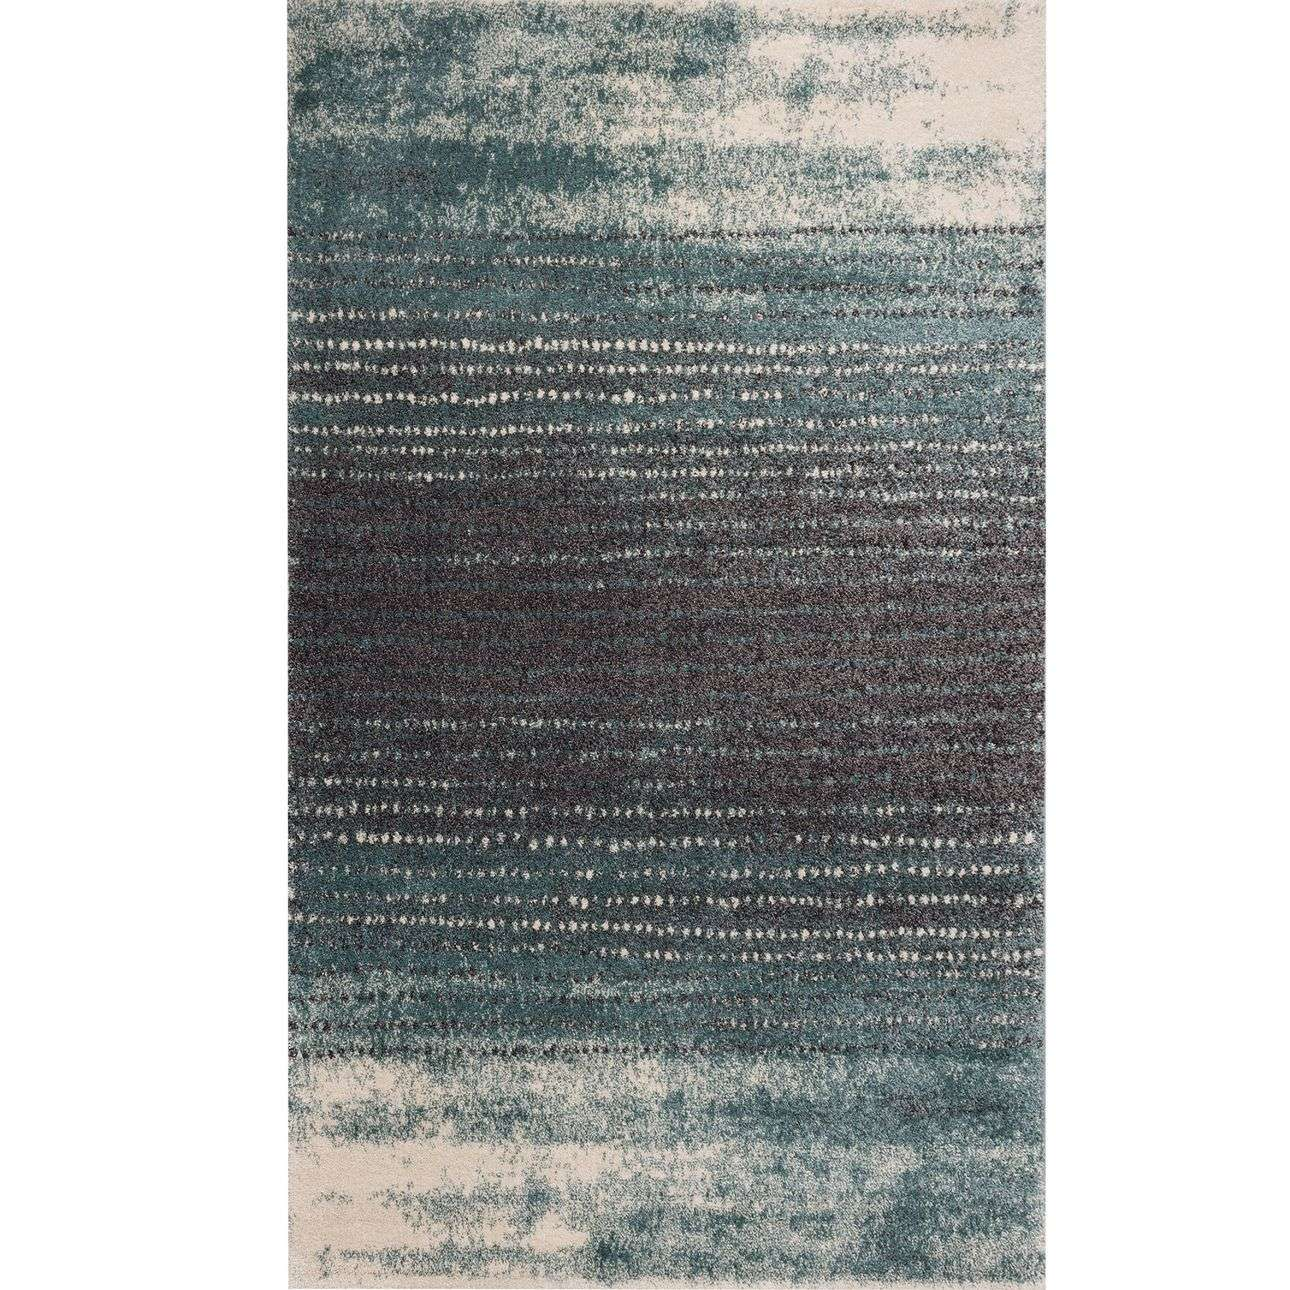 Koberec Modern Teal blue-dark grey 160x230cm